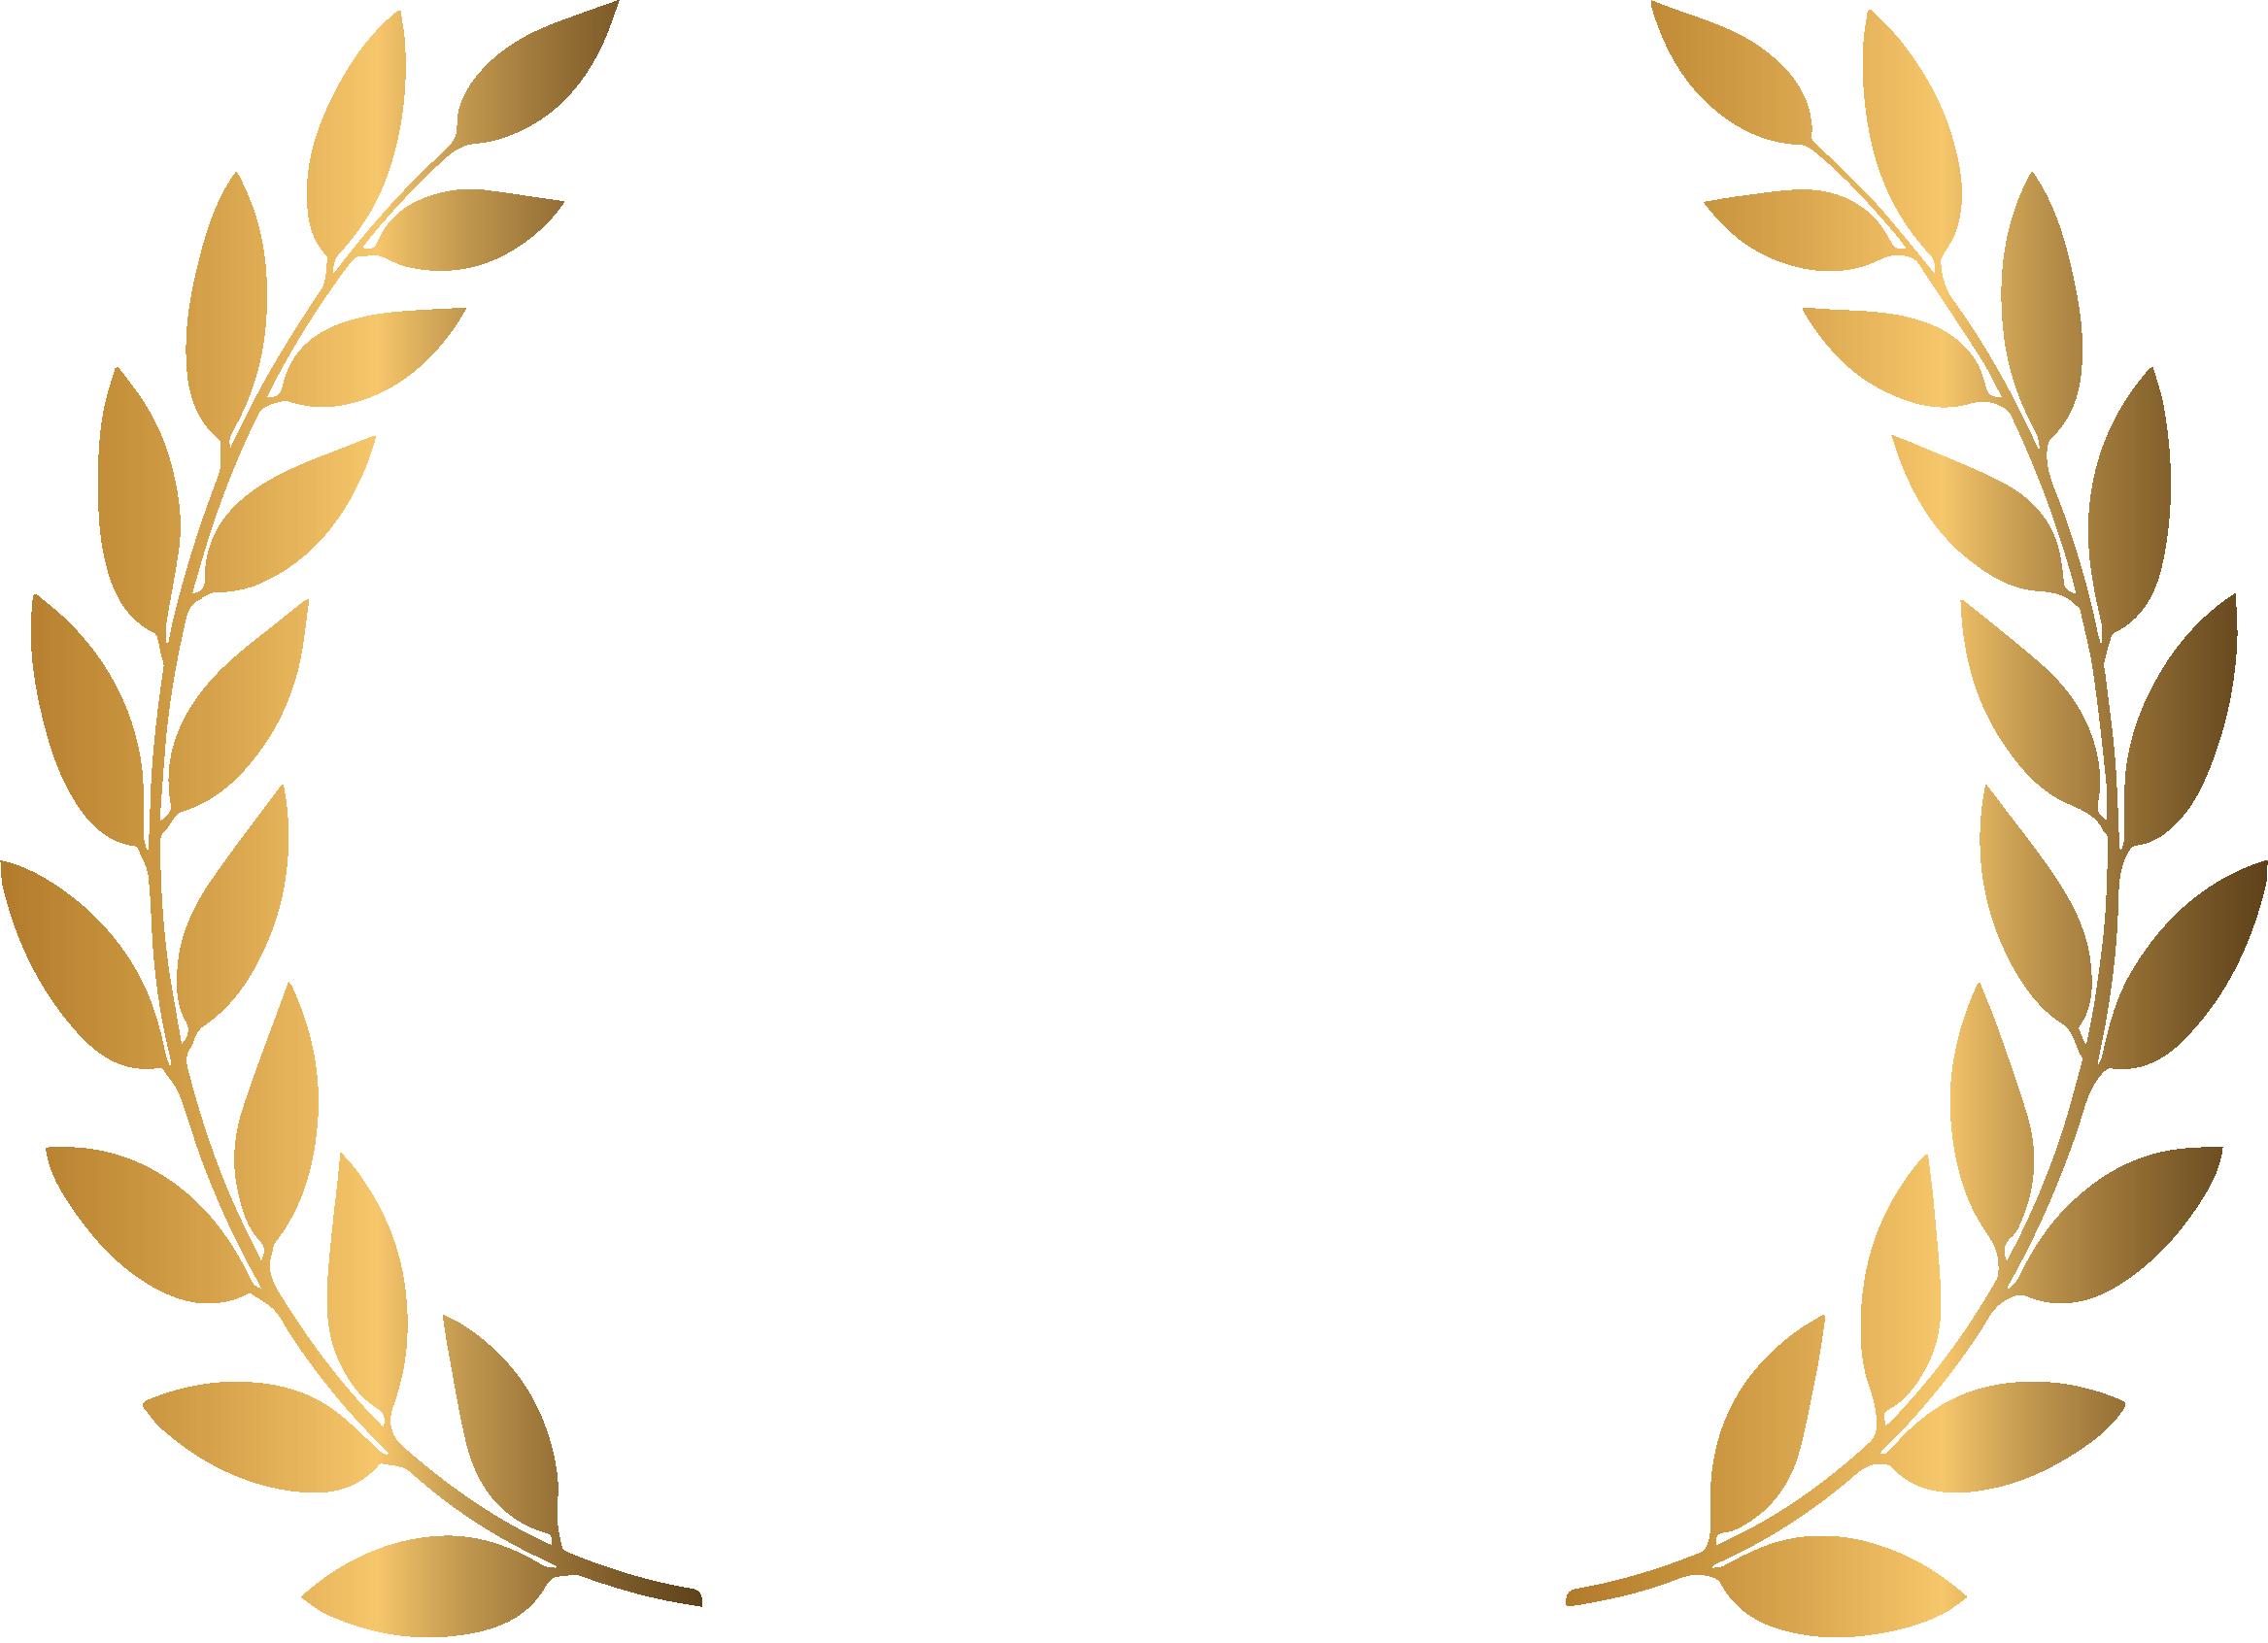 IT TORI Award